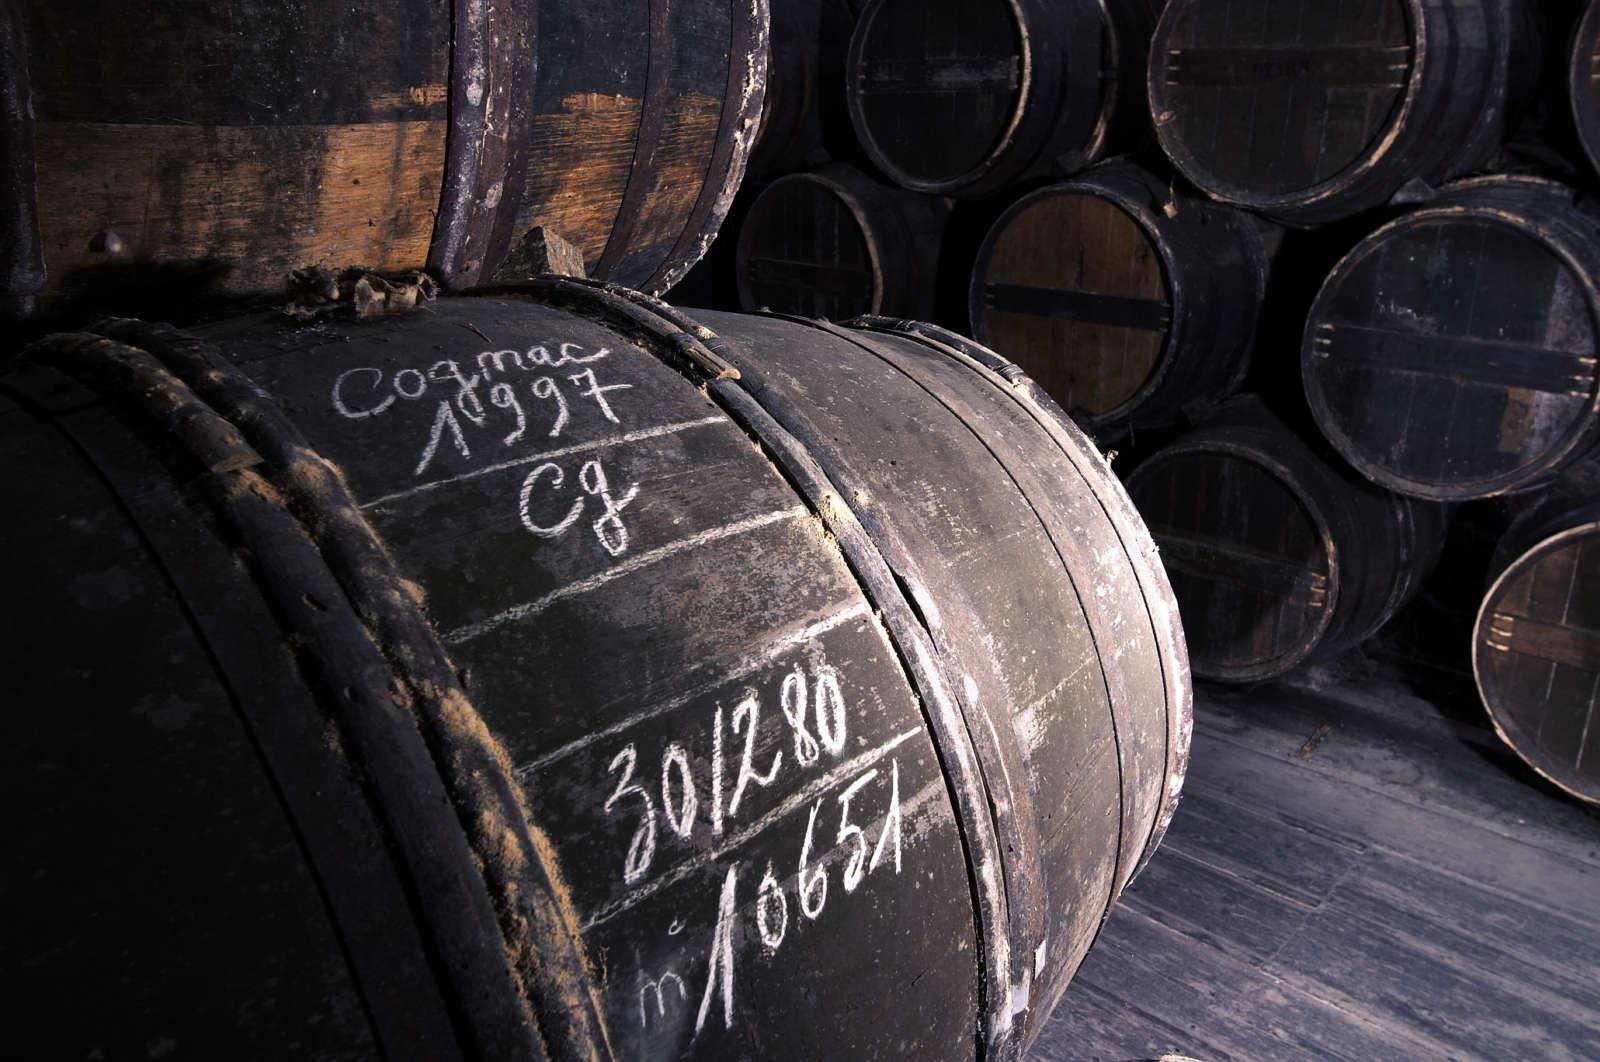 Botti per l'affinamento del Cognac